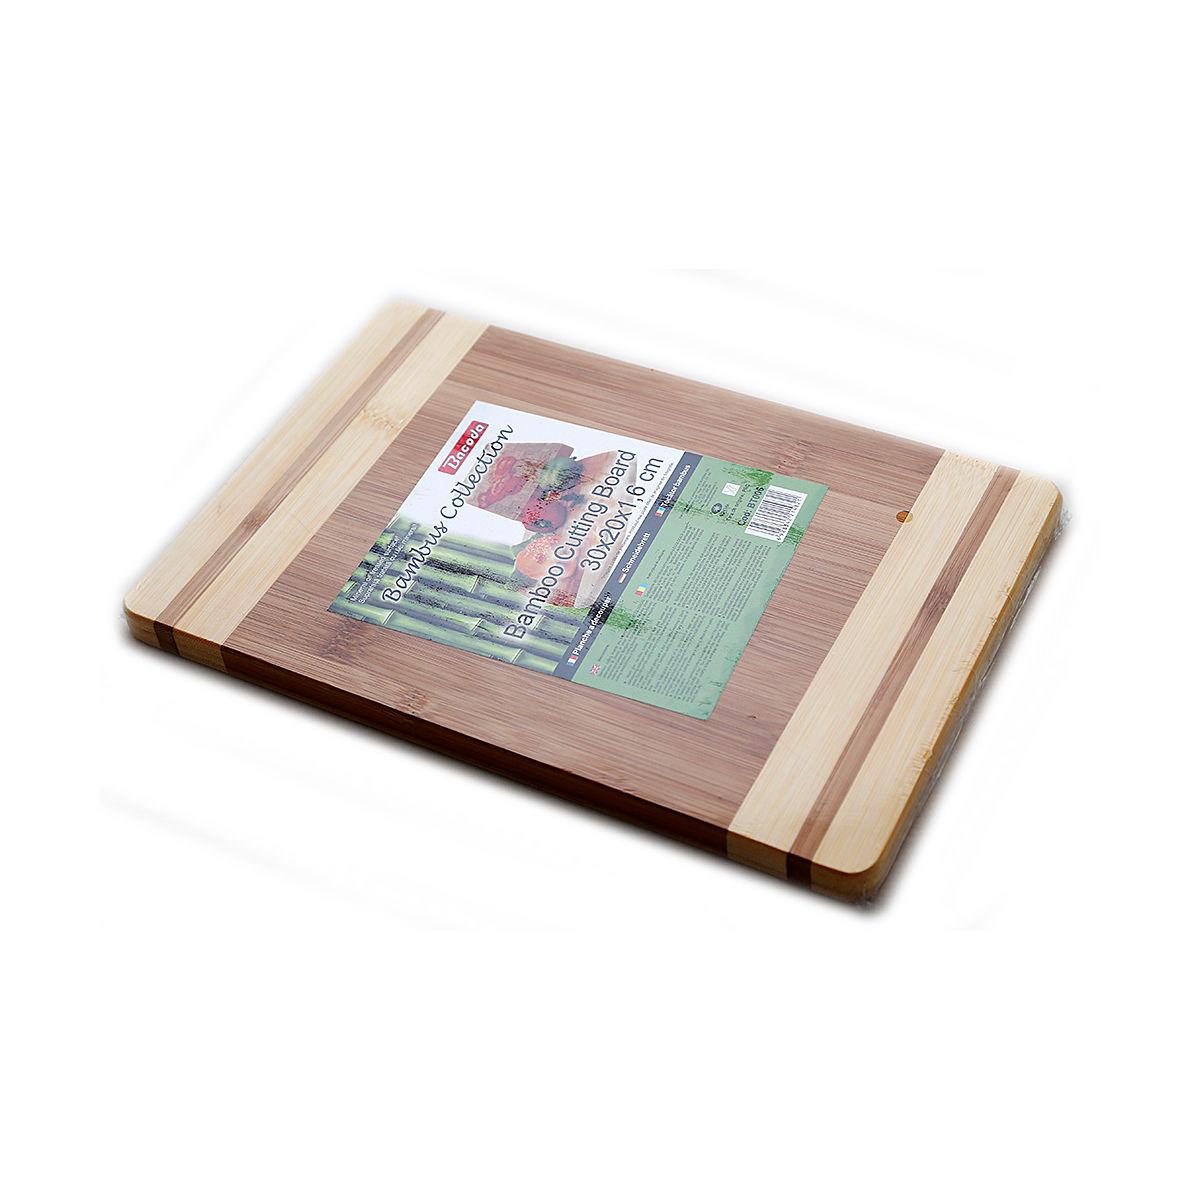 Bacoda Tocator Bambus Bicolor 30*20*1.6 Cm 2021 aranjareamesei.ro